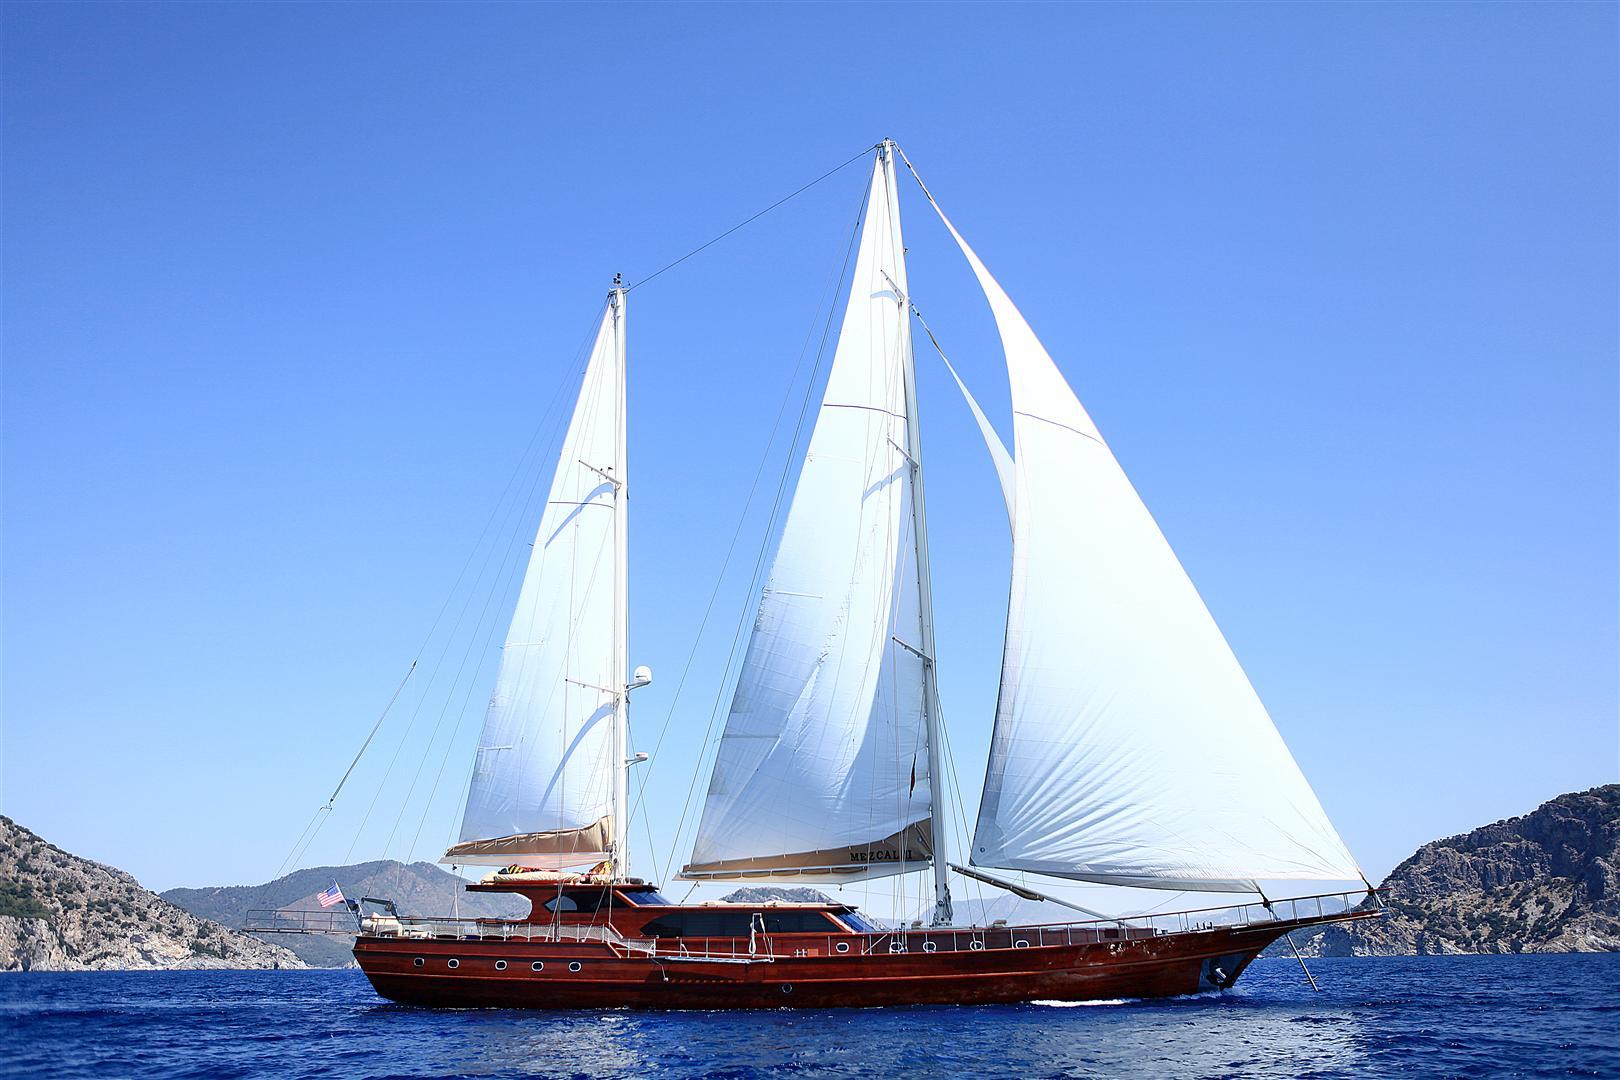 Gulet MEZCAL 2 - Sailing